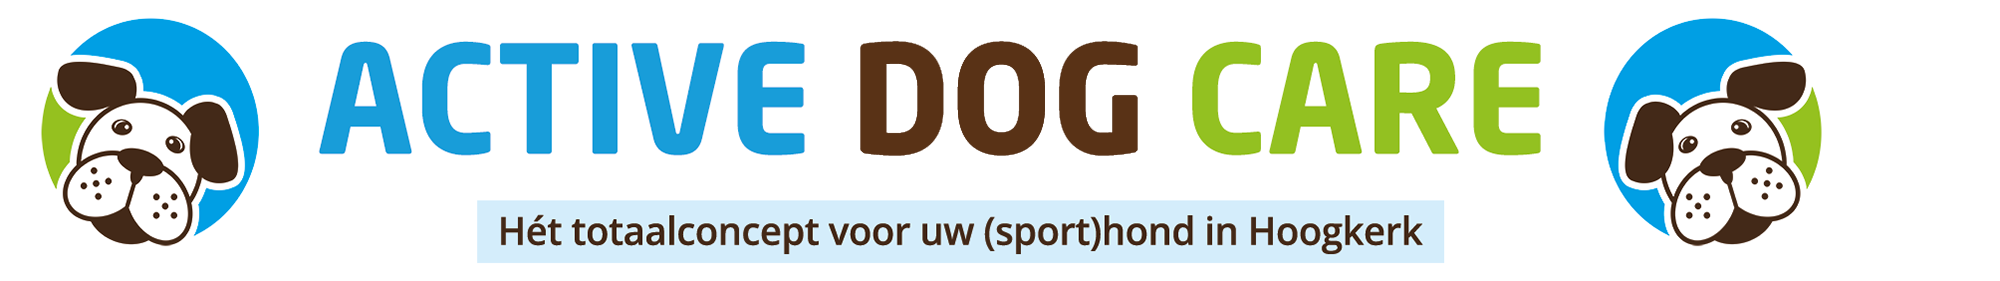 Active Dog Care Hoogkerk